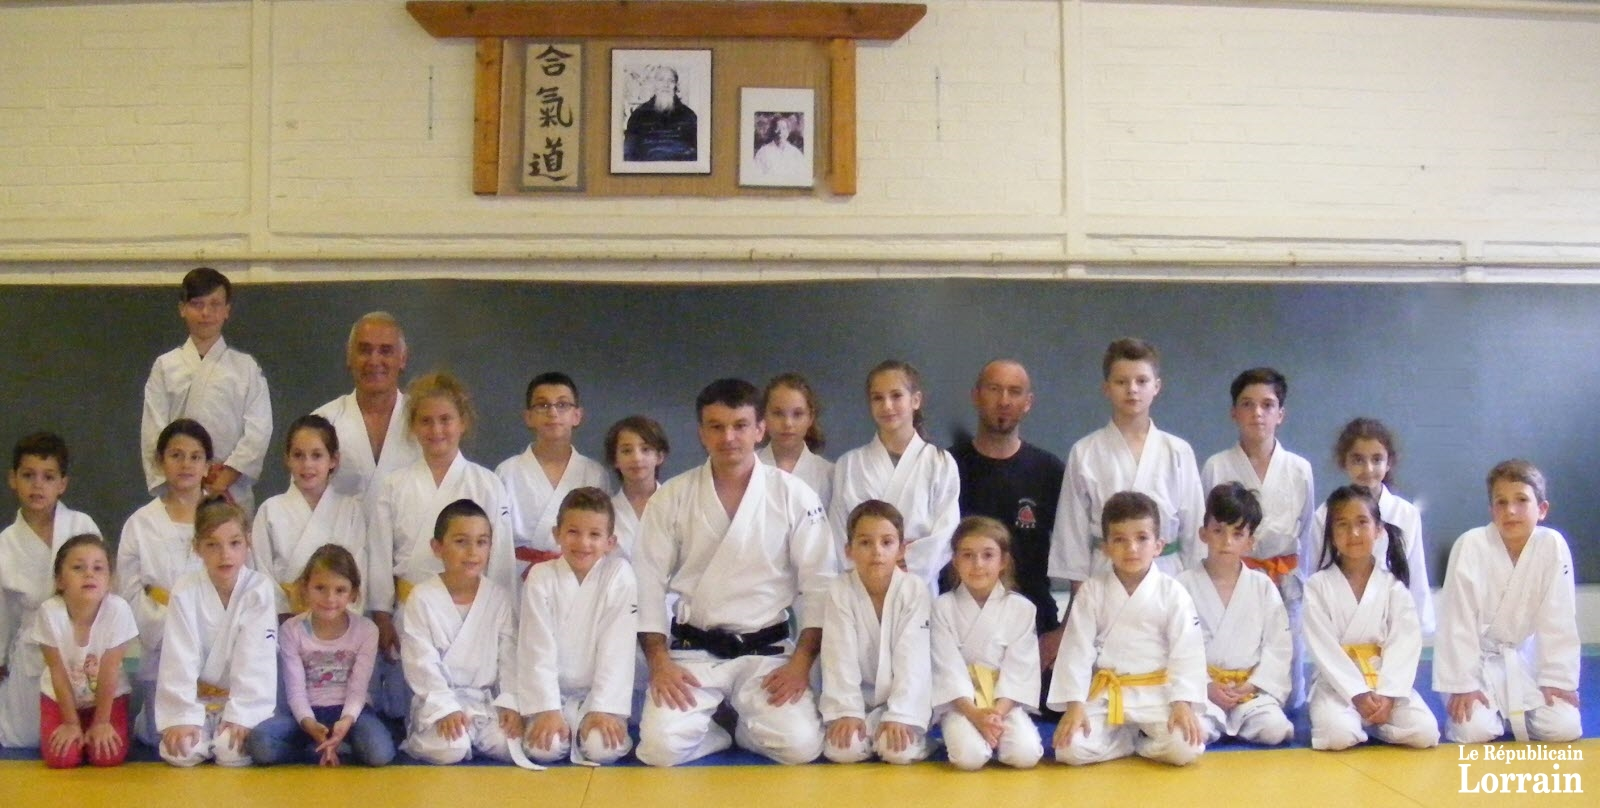 Herserange : l'aïkido, une discipline pour rester zen